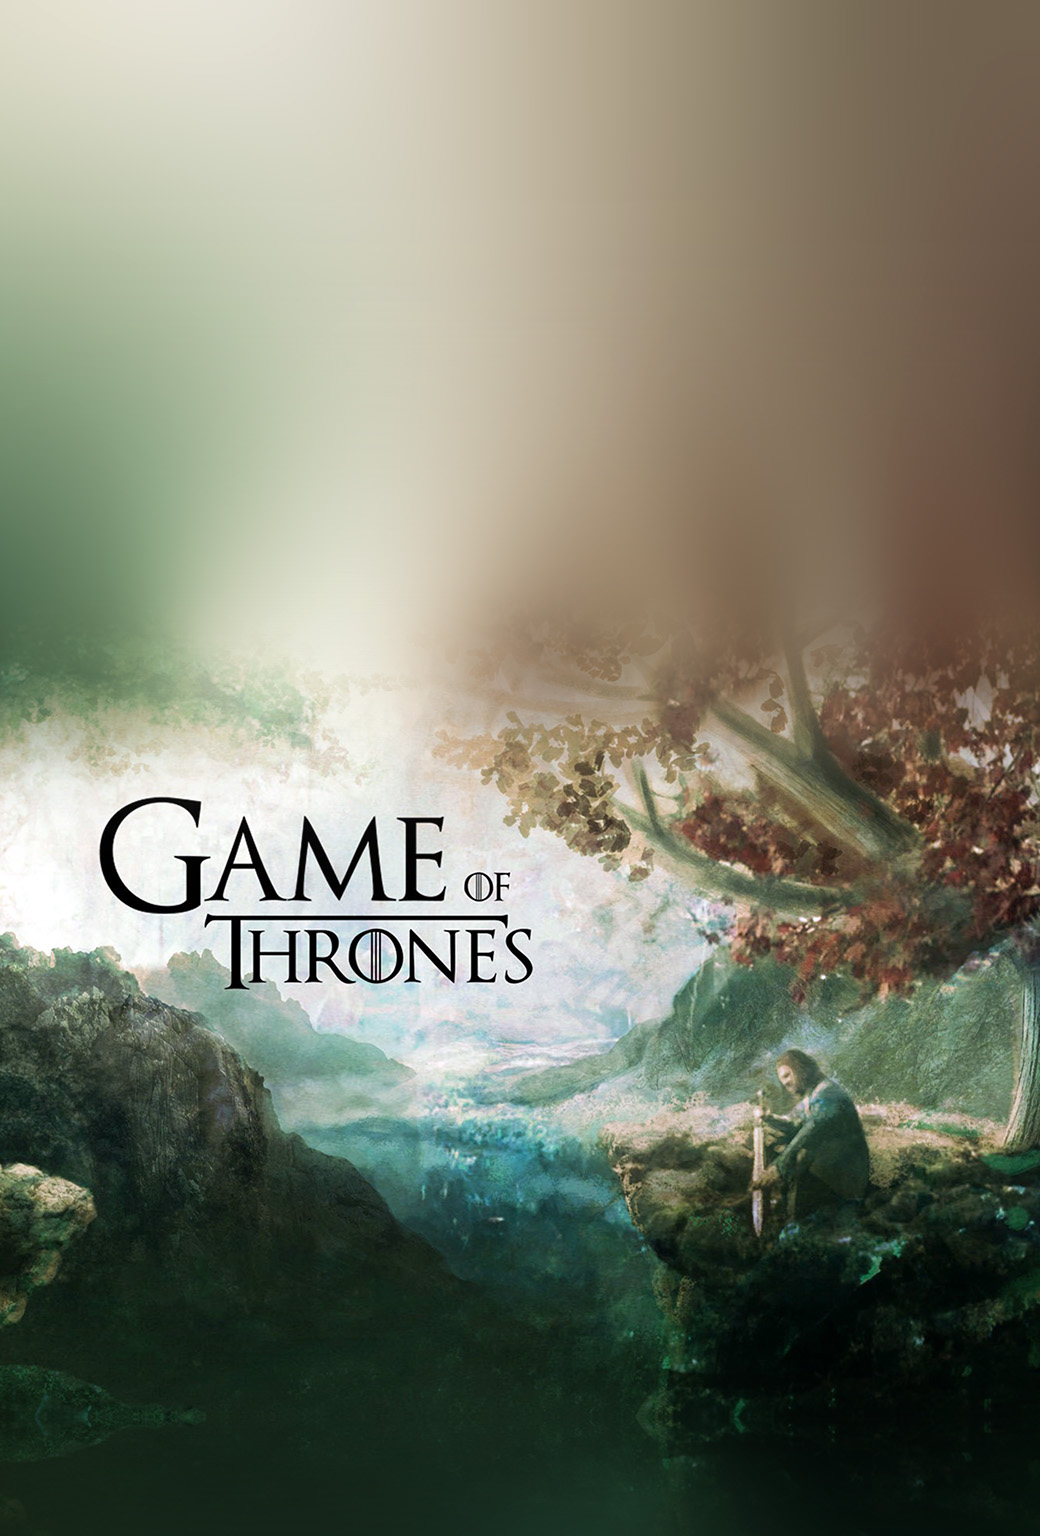 Game Of Thrones Iphone Wallpaper Hd Zoom Wallpapers 1040x1536